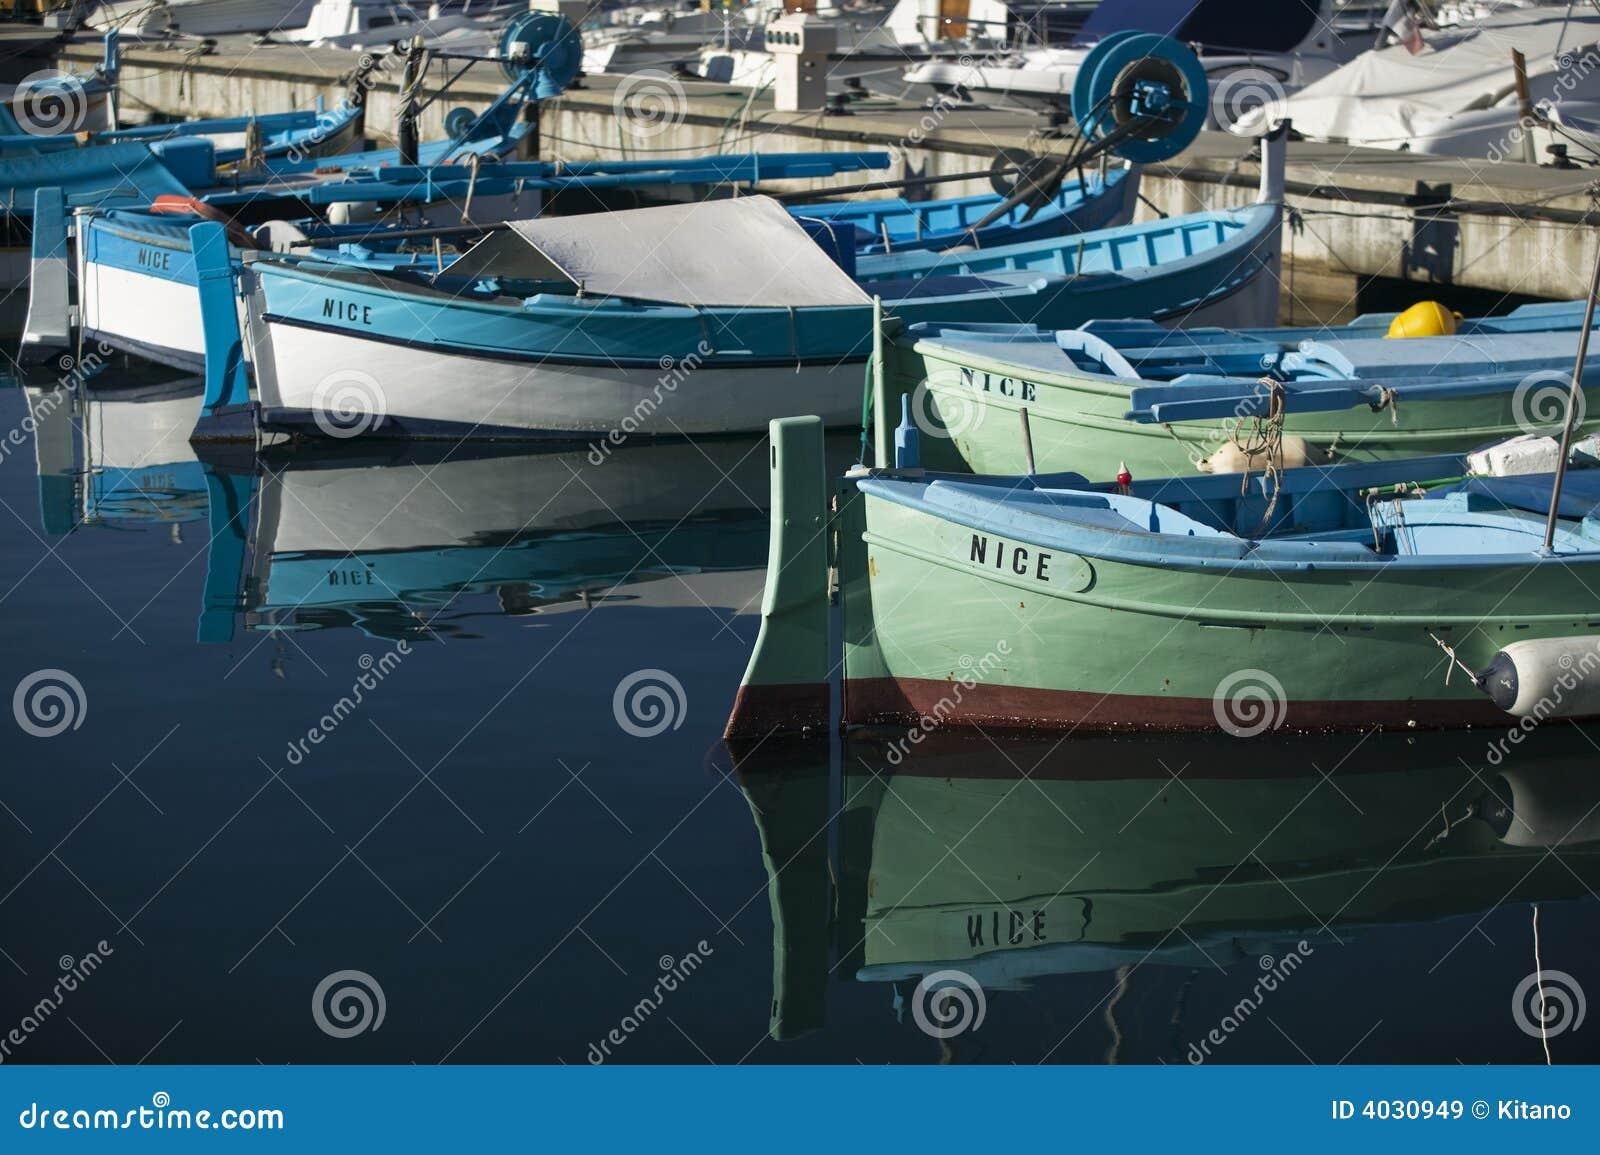 Nice fishing boats at harbor royalty free stock images for Nice fishing boats